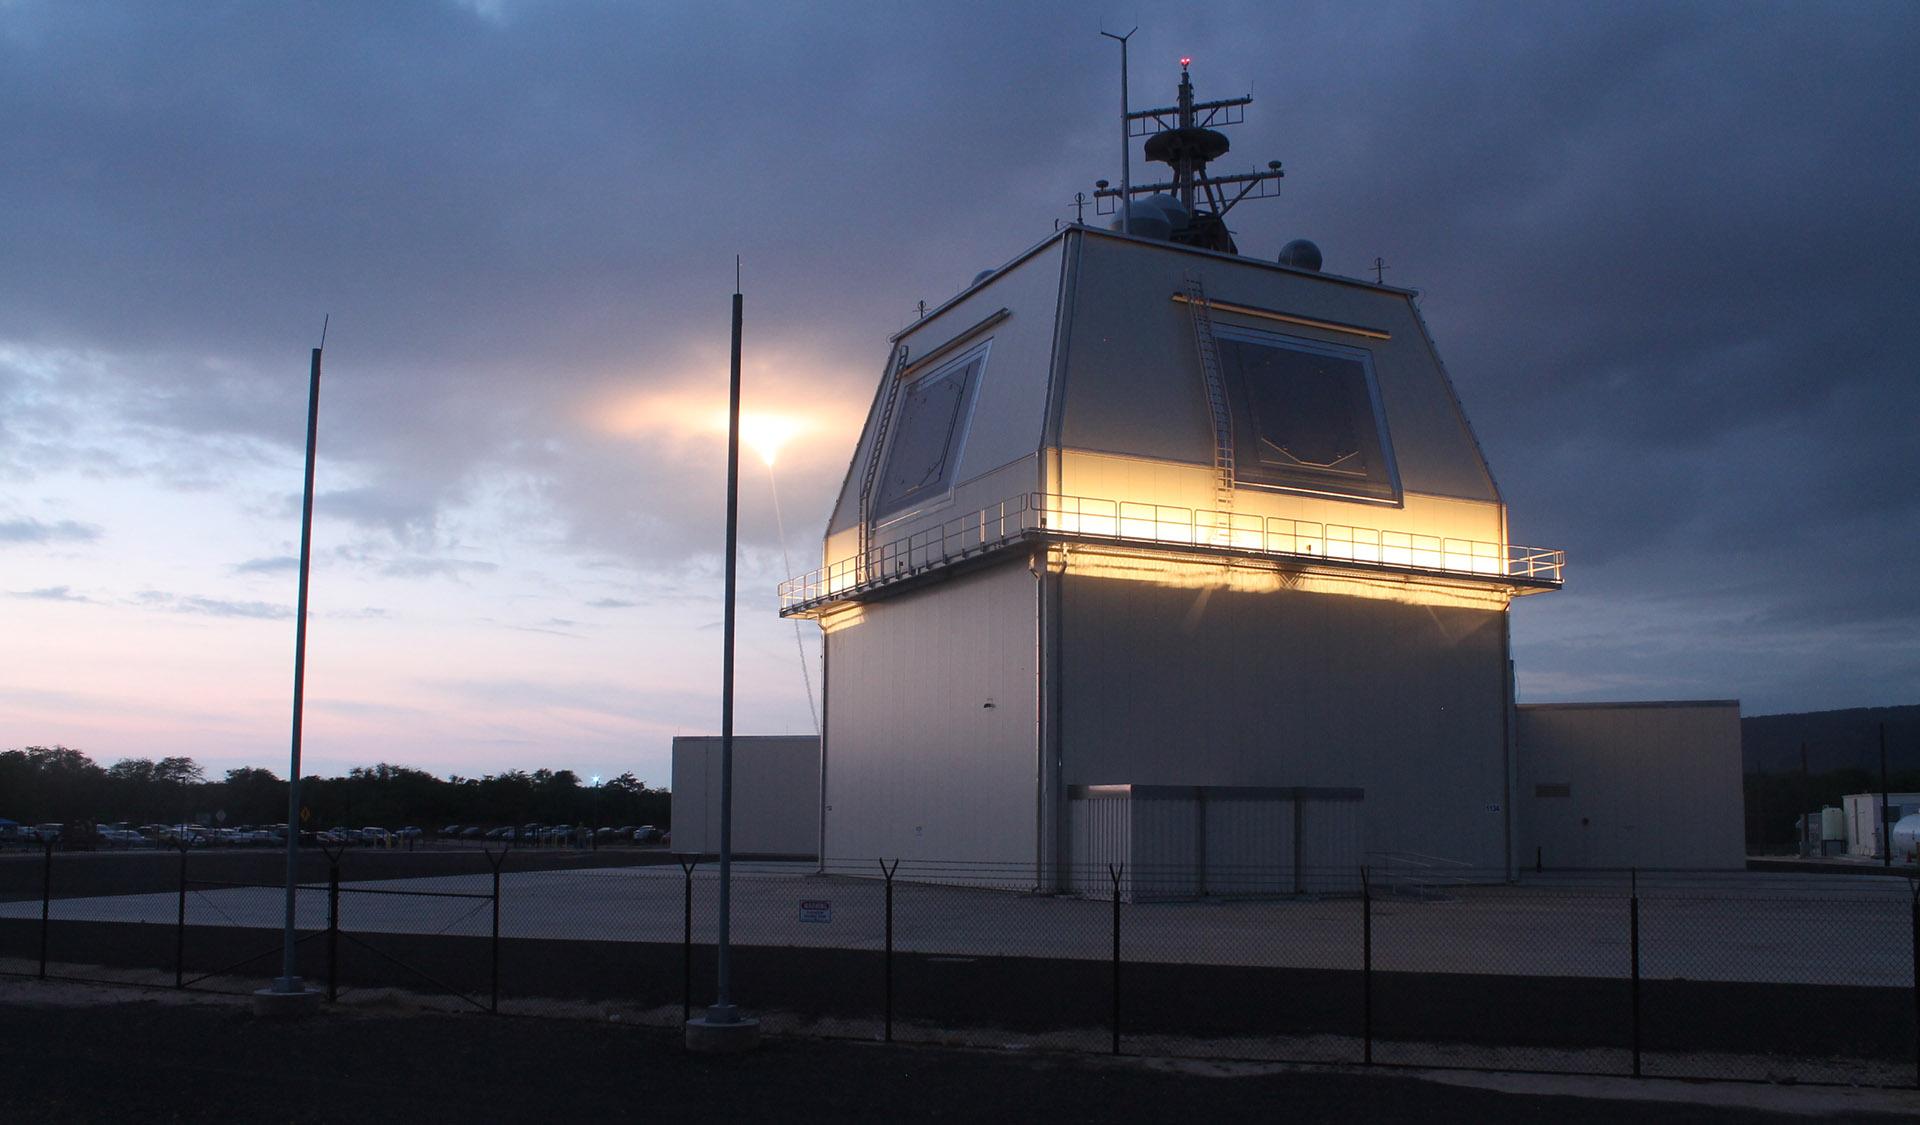 aegis-ashore-missile-defense.jpg